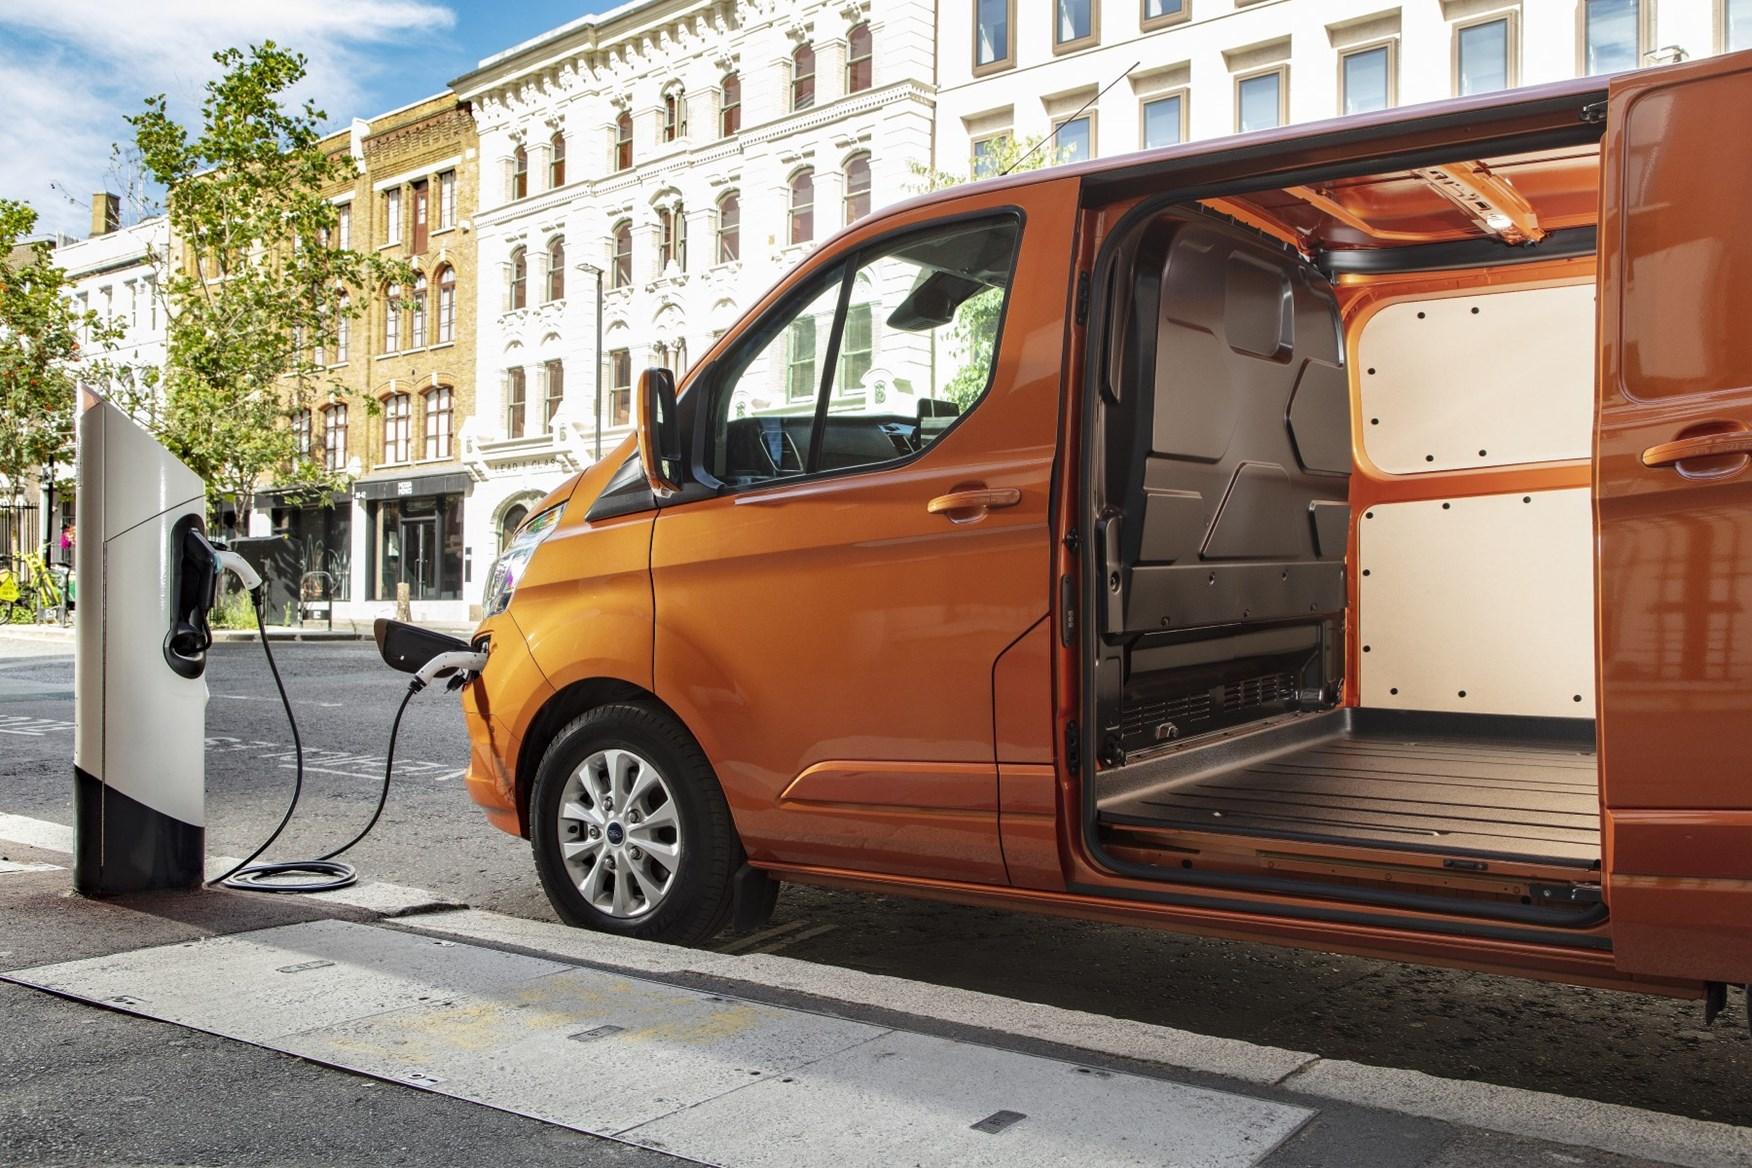 2020 Ford Transit Custom Plug-In Hybrid - plugged in, charging